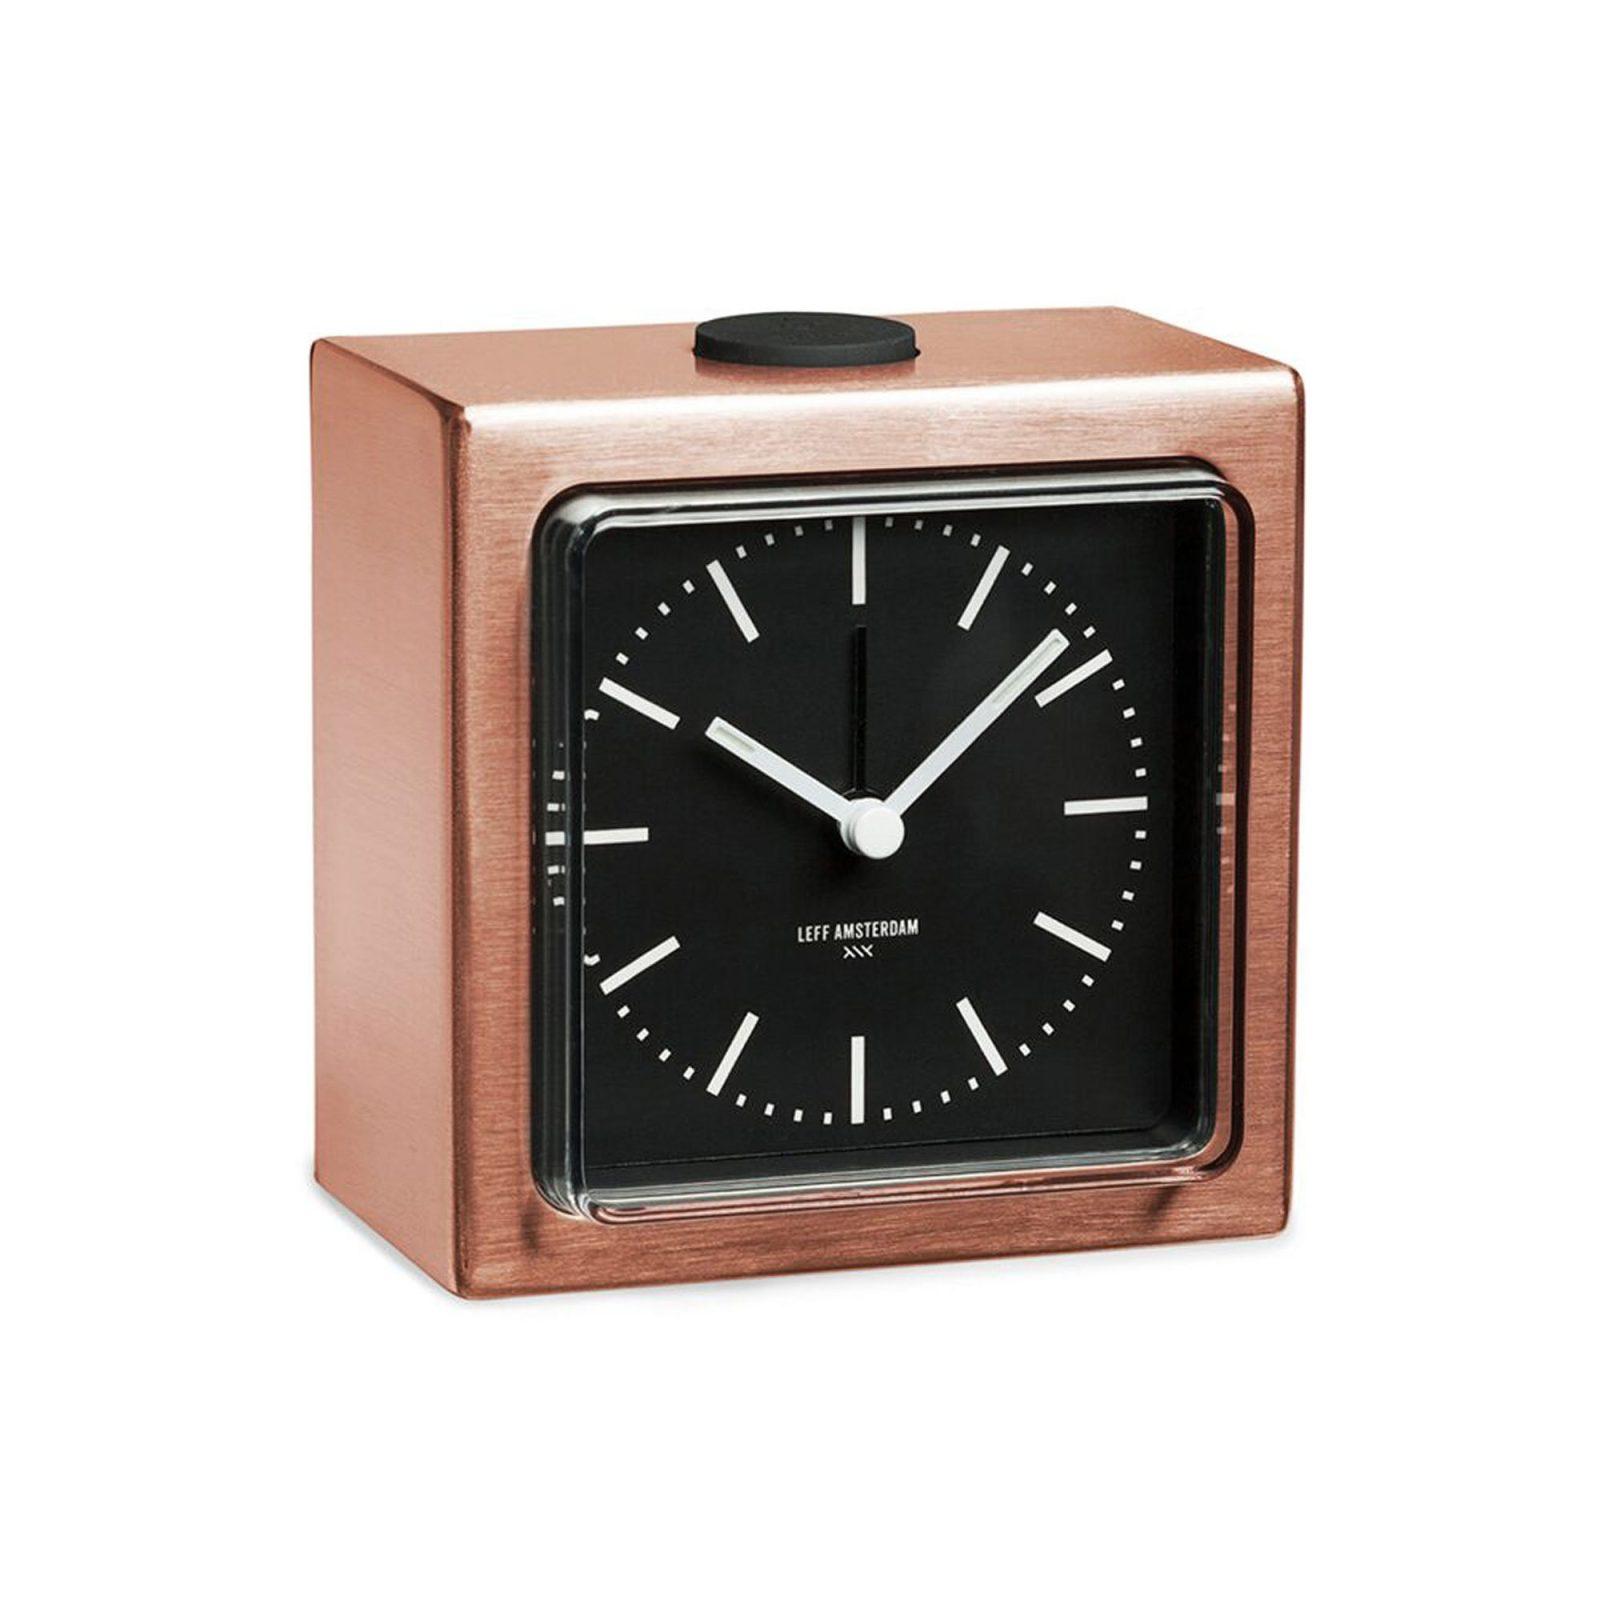 leff-amsterdam-block-alarm-clock-copper-2